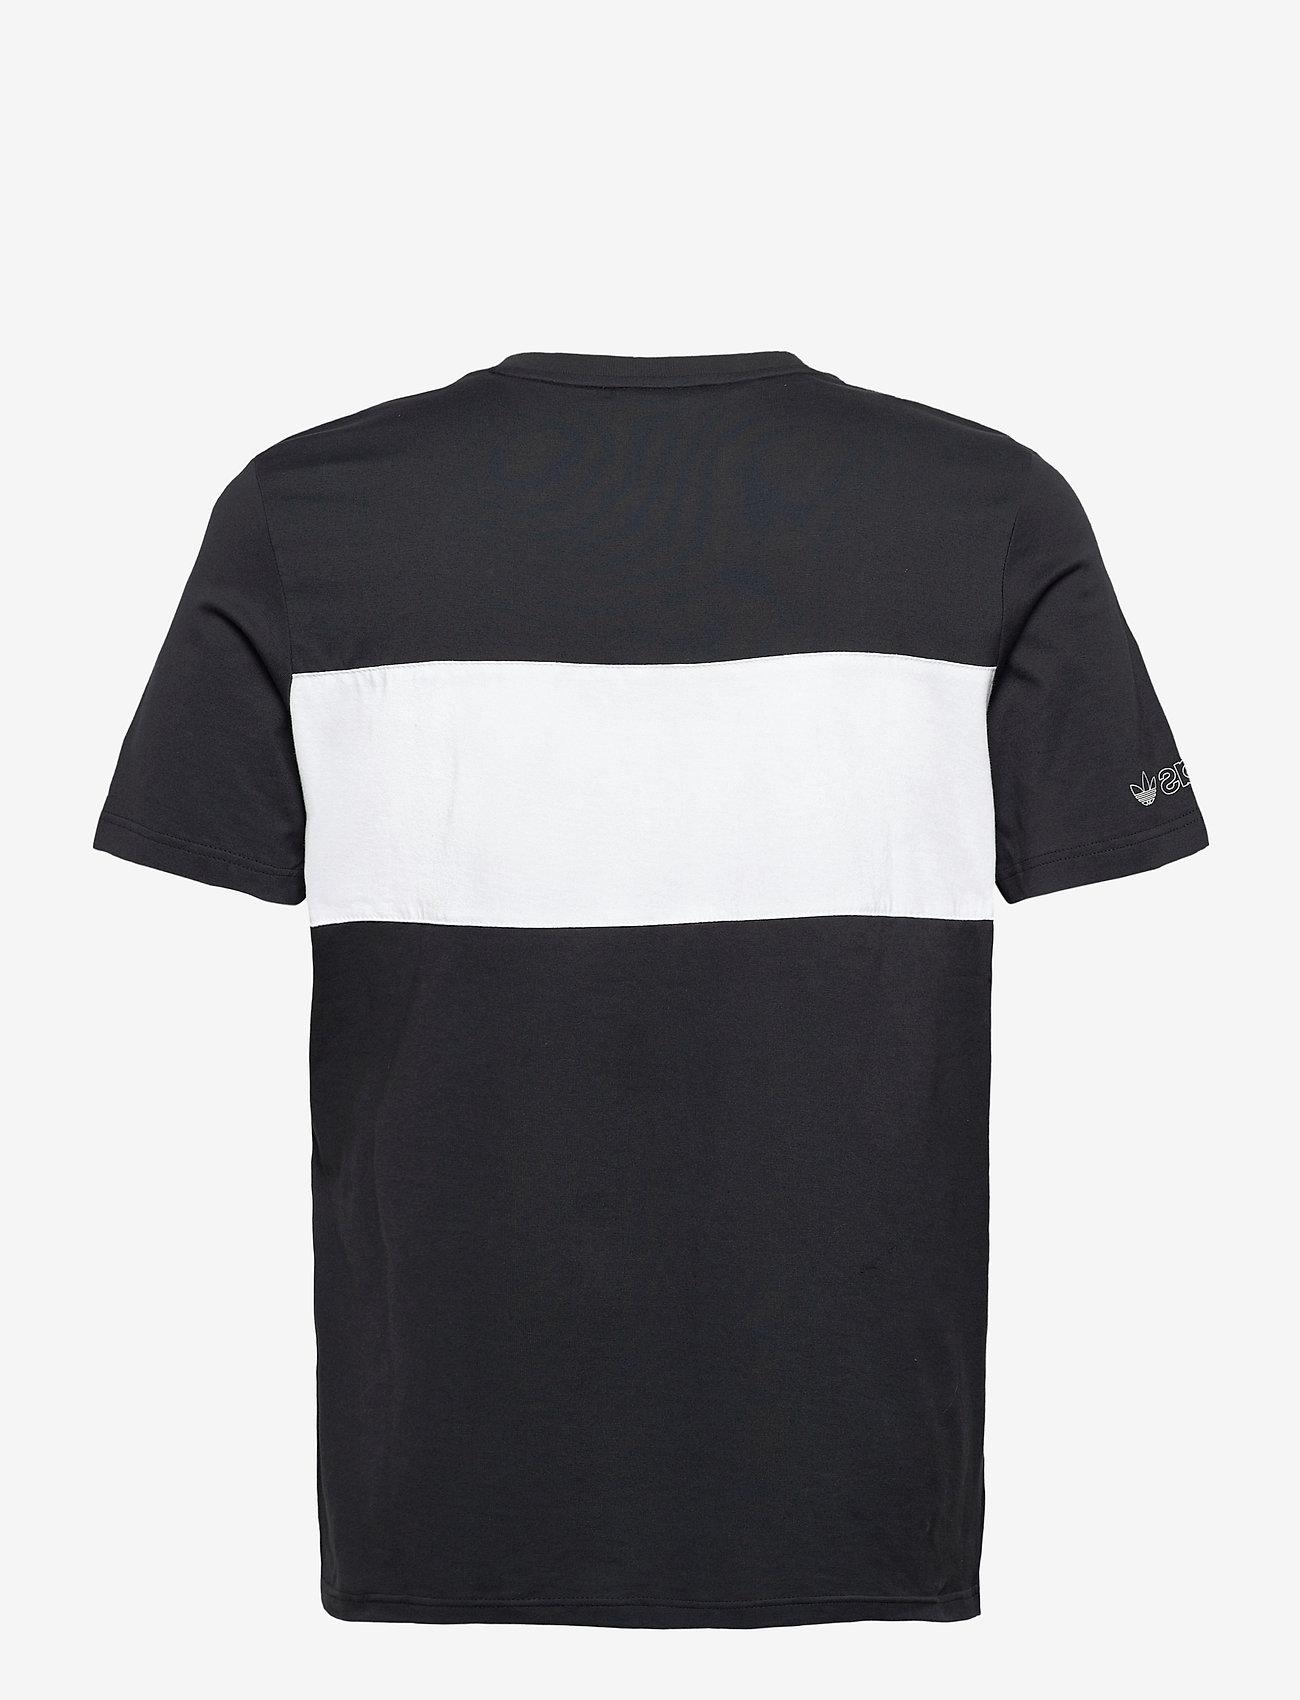 adidas Originals PANEL TRF TEE - T-skjorter NTGREY - Menn Klær